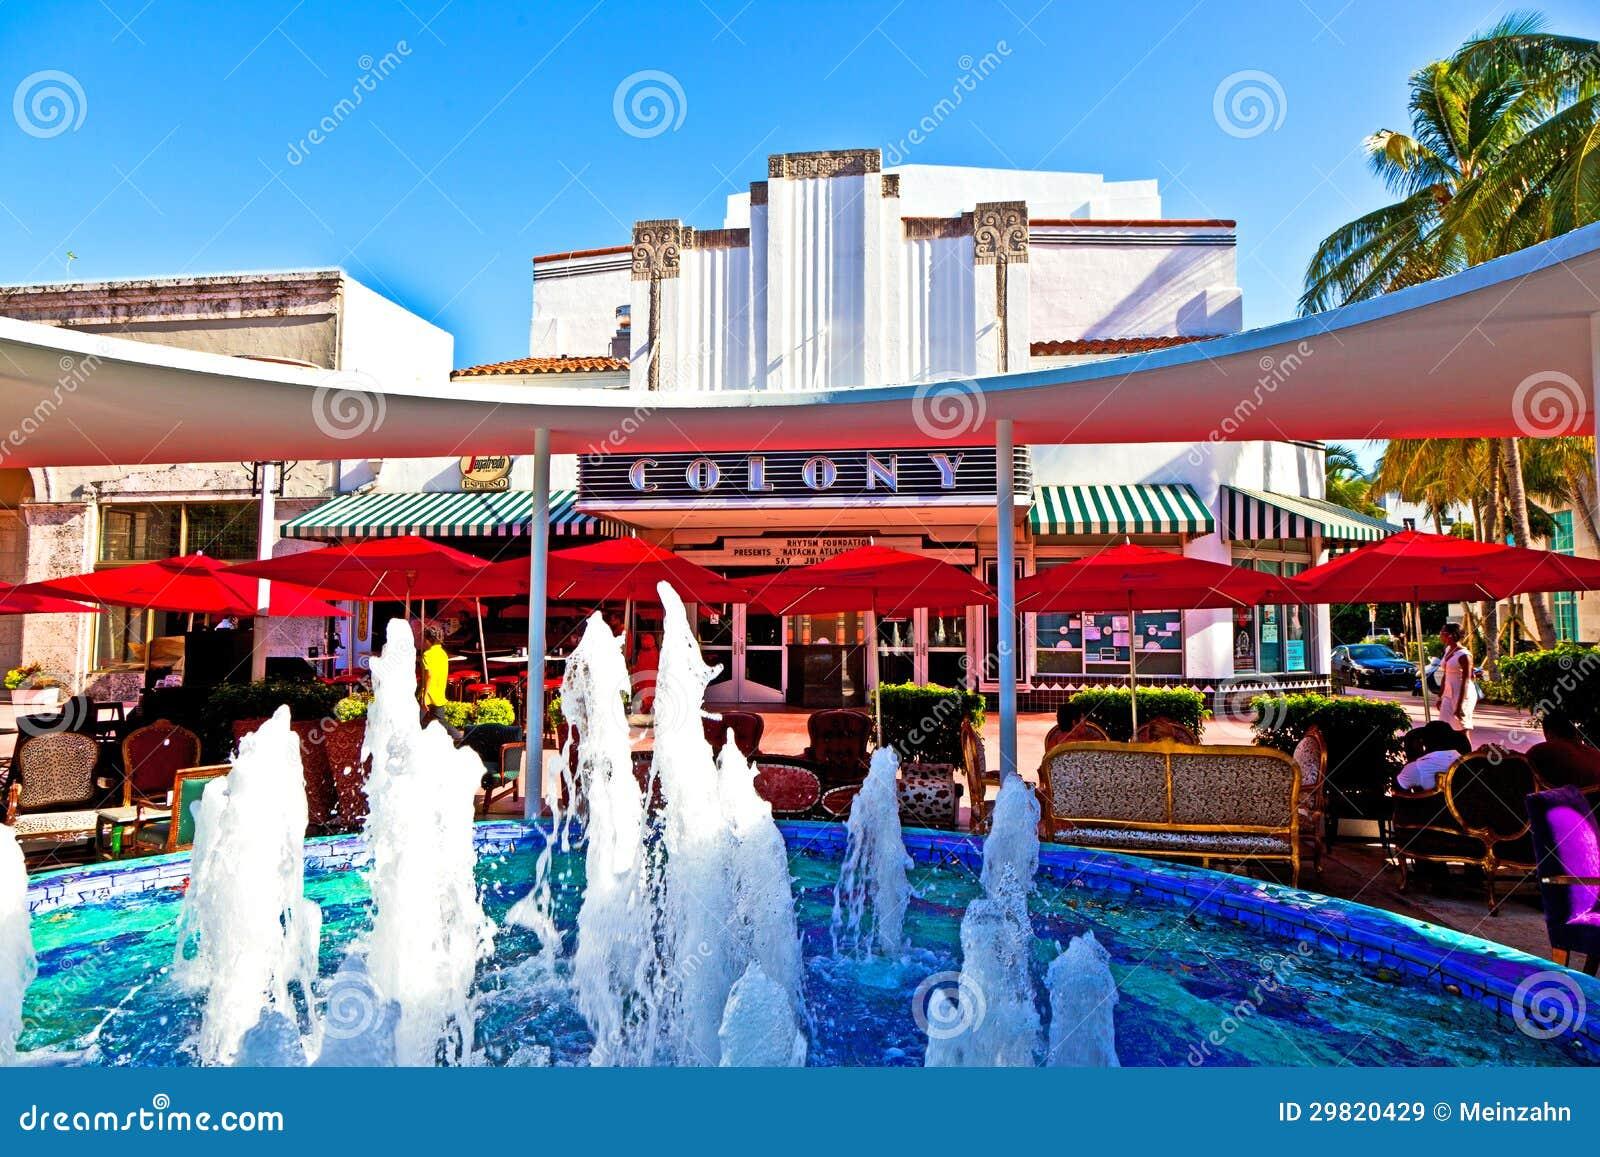 Colony Theater South Beach Miami